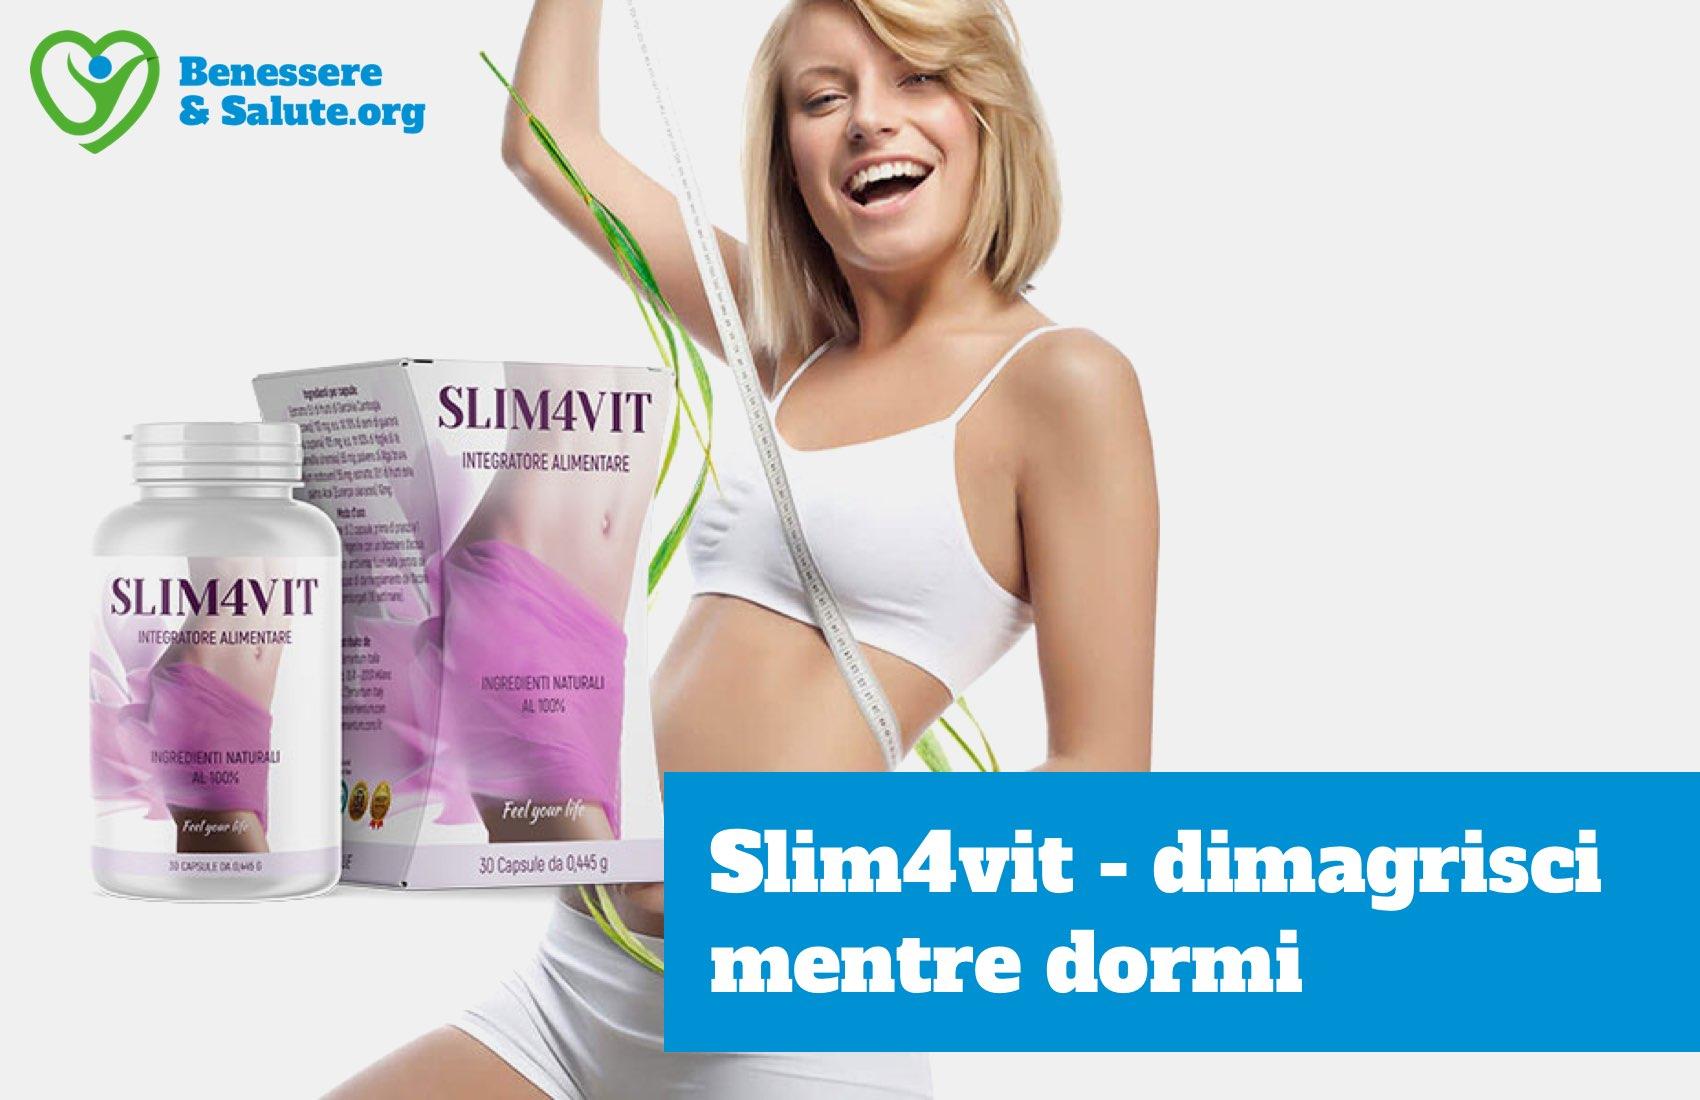 Slim4vit integratore dimagrimento